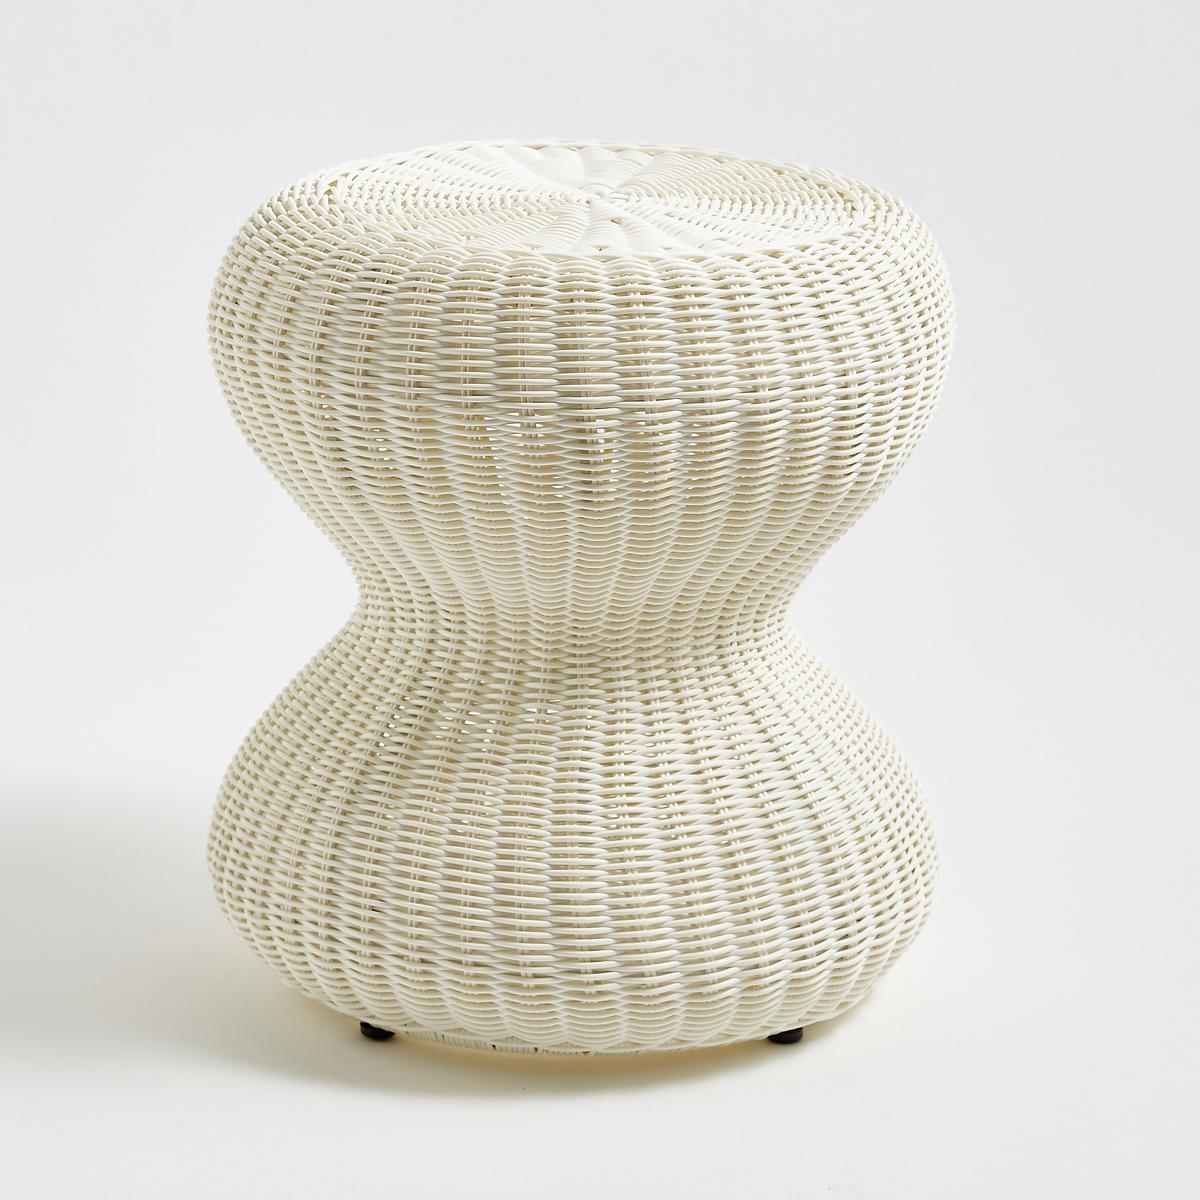 Табурет плетеный из пластмассы Vilmine